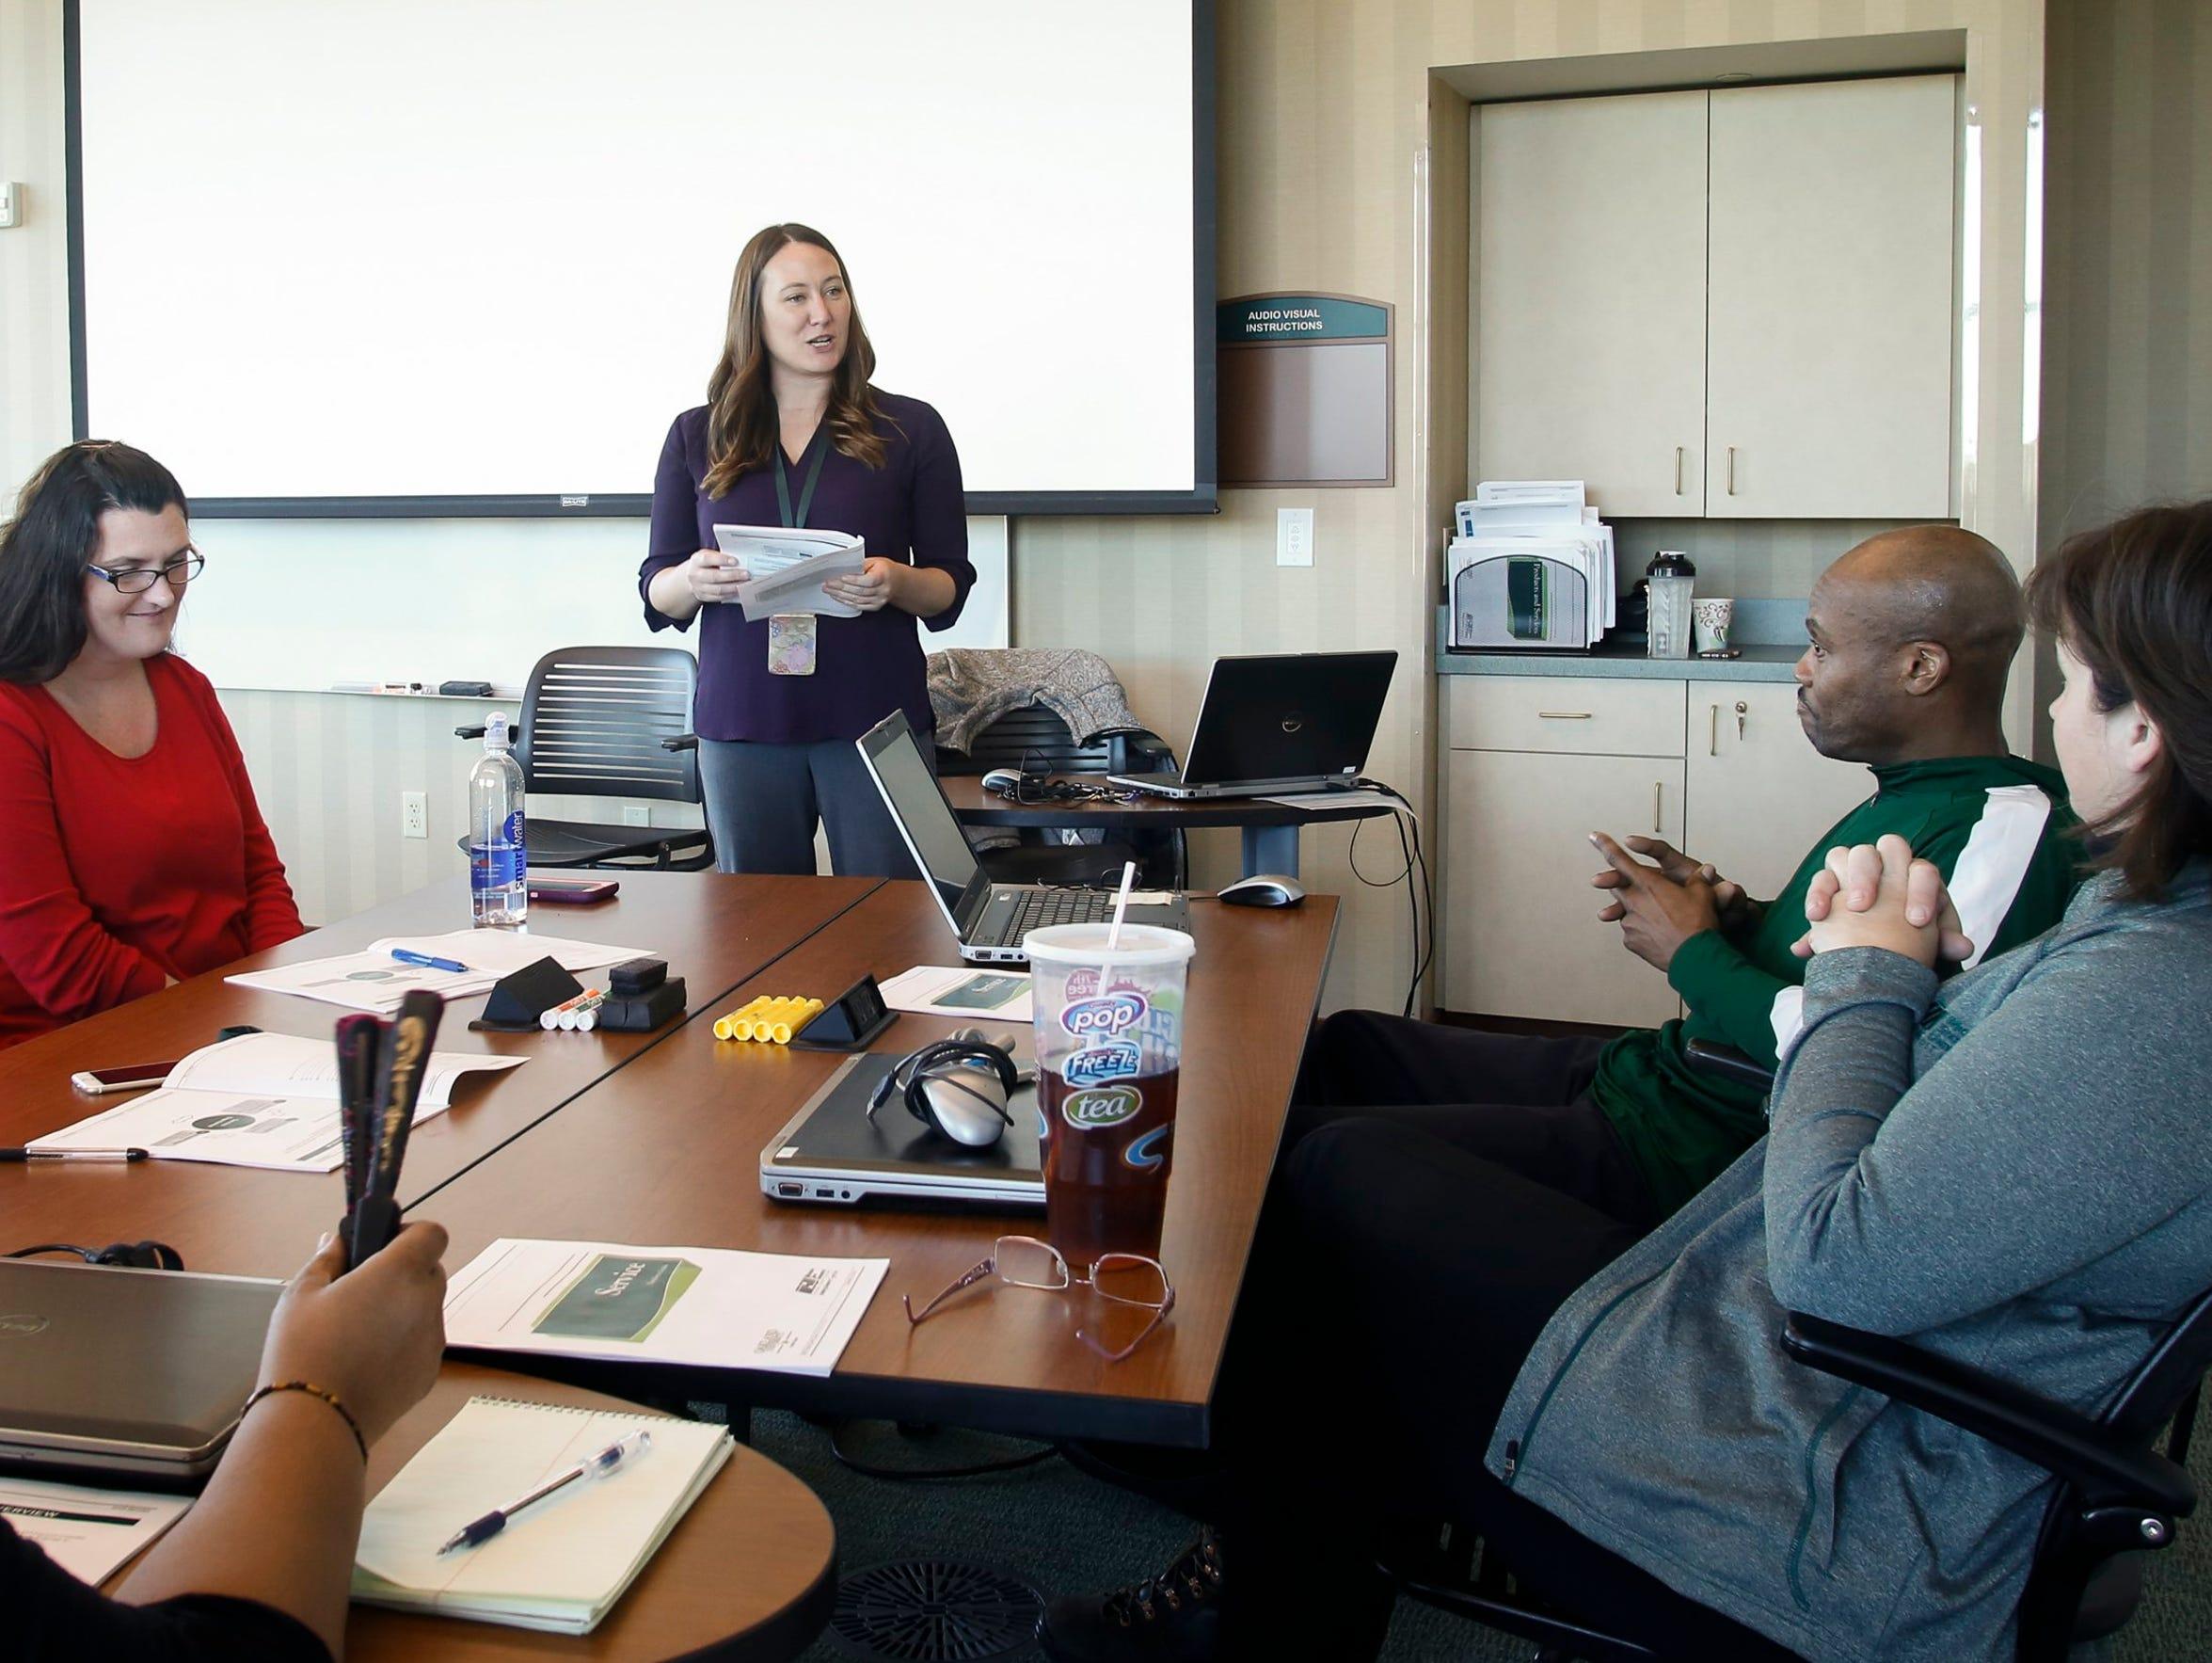 Jen Branch trains new employees Thursday, Nov. 10,